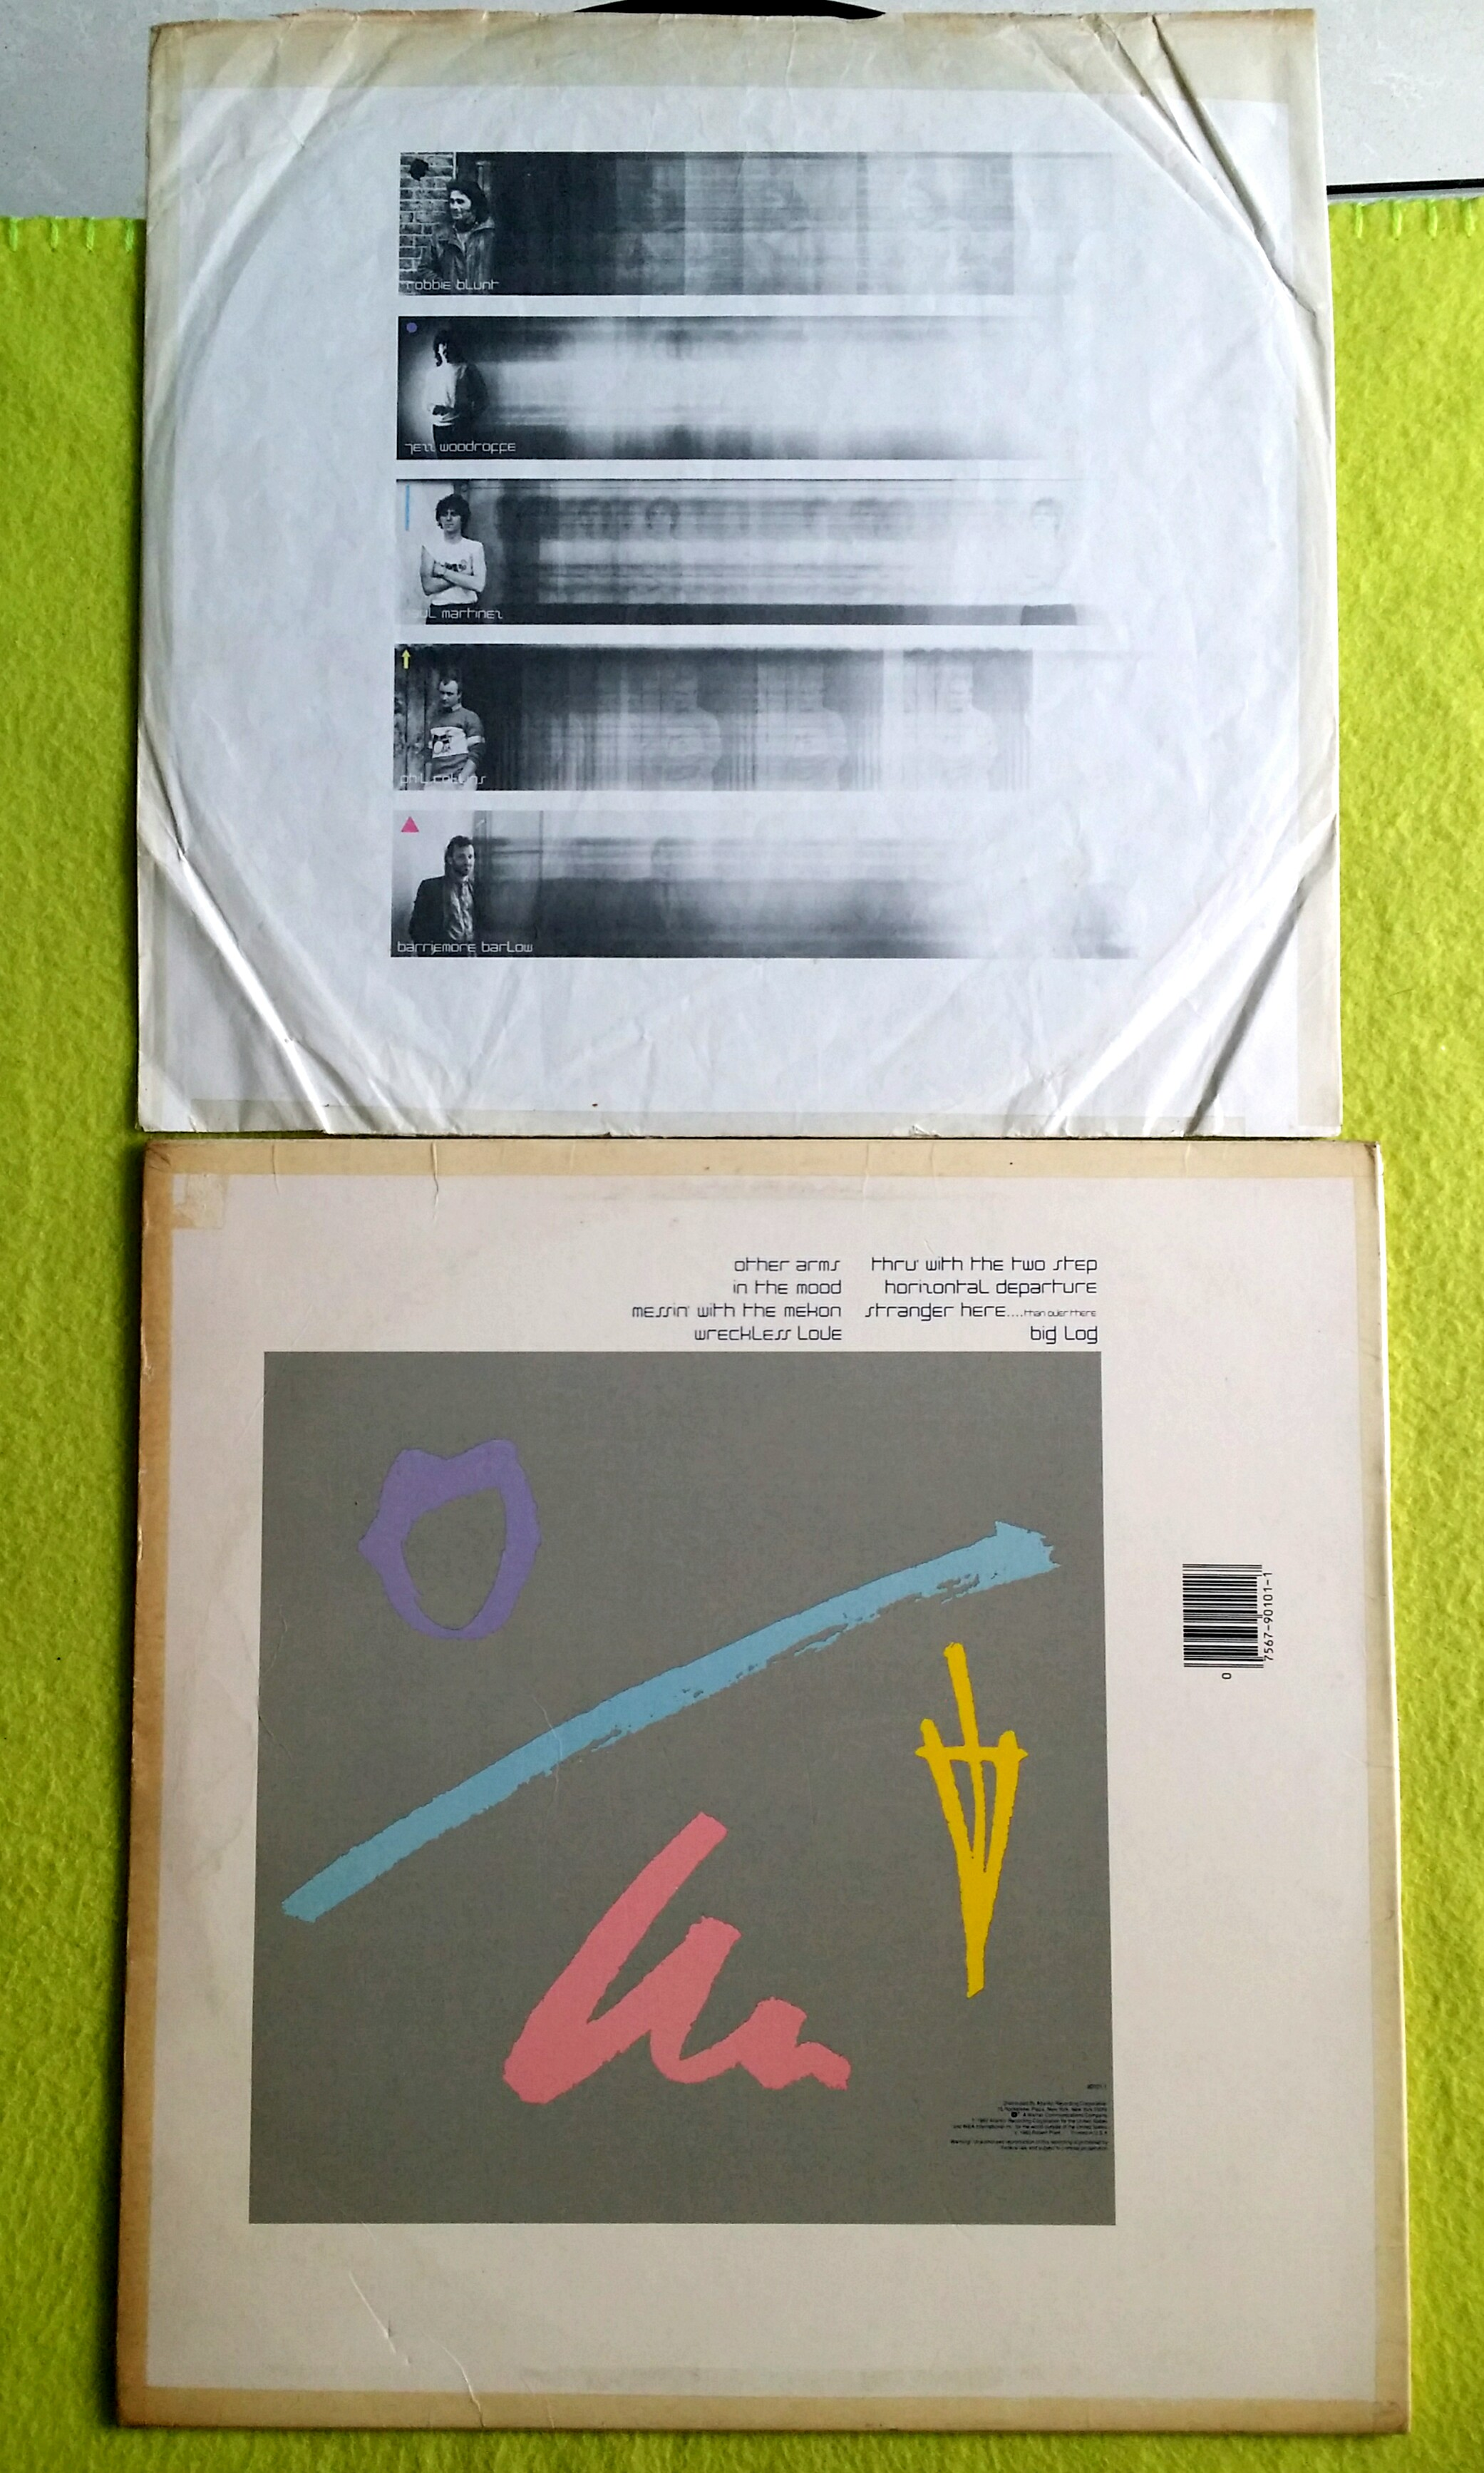 a077d152d ROBERT PLANT (Lead vocalist of Led Zeppelin) the principle of moments.  Vinyl record, Vintage & Collectibles, Vintage Collectibles on Carousell